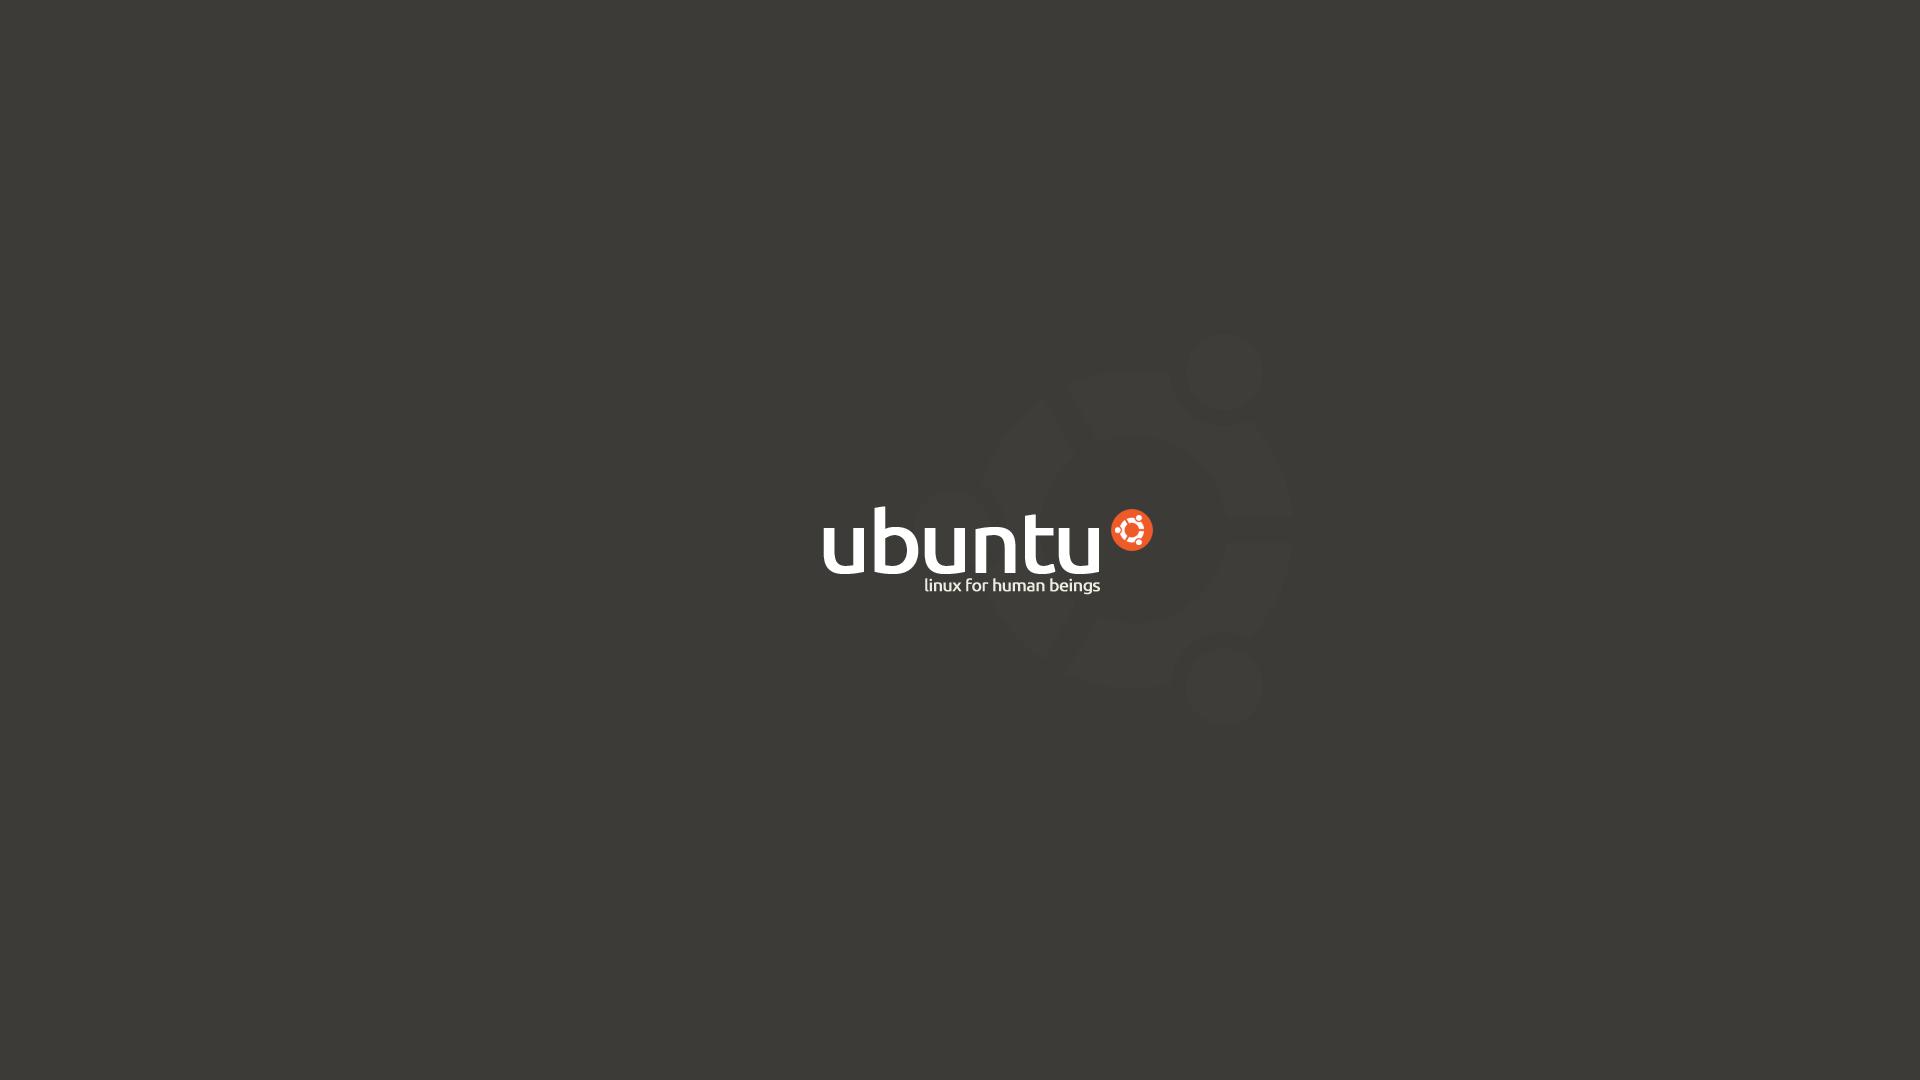 Wallpapers Ubuntu Linux Wallpapers: WebUbuntu